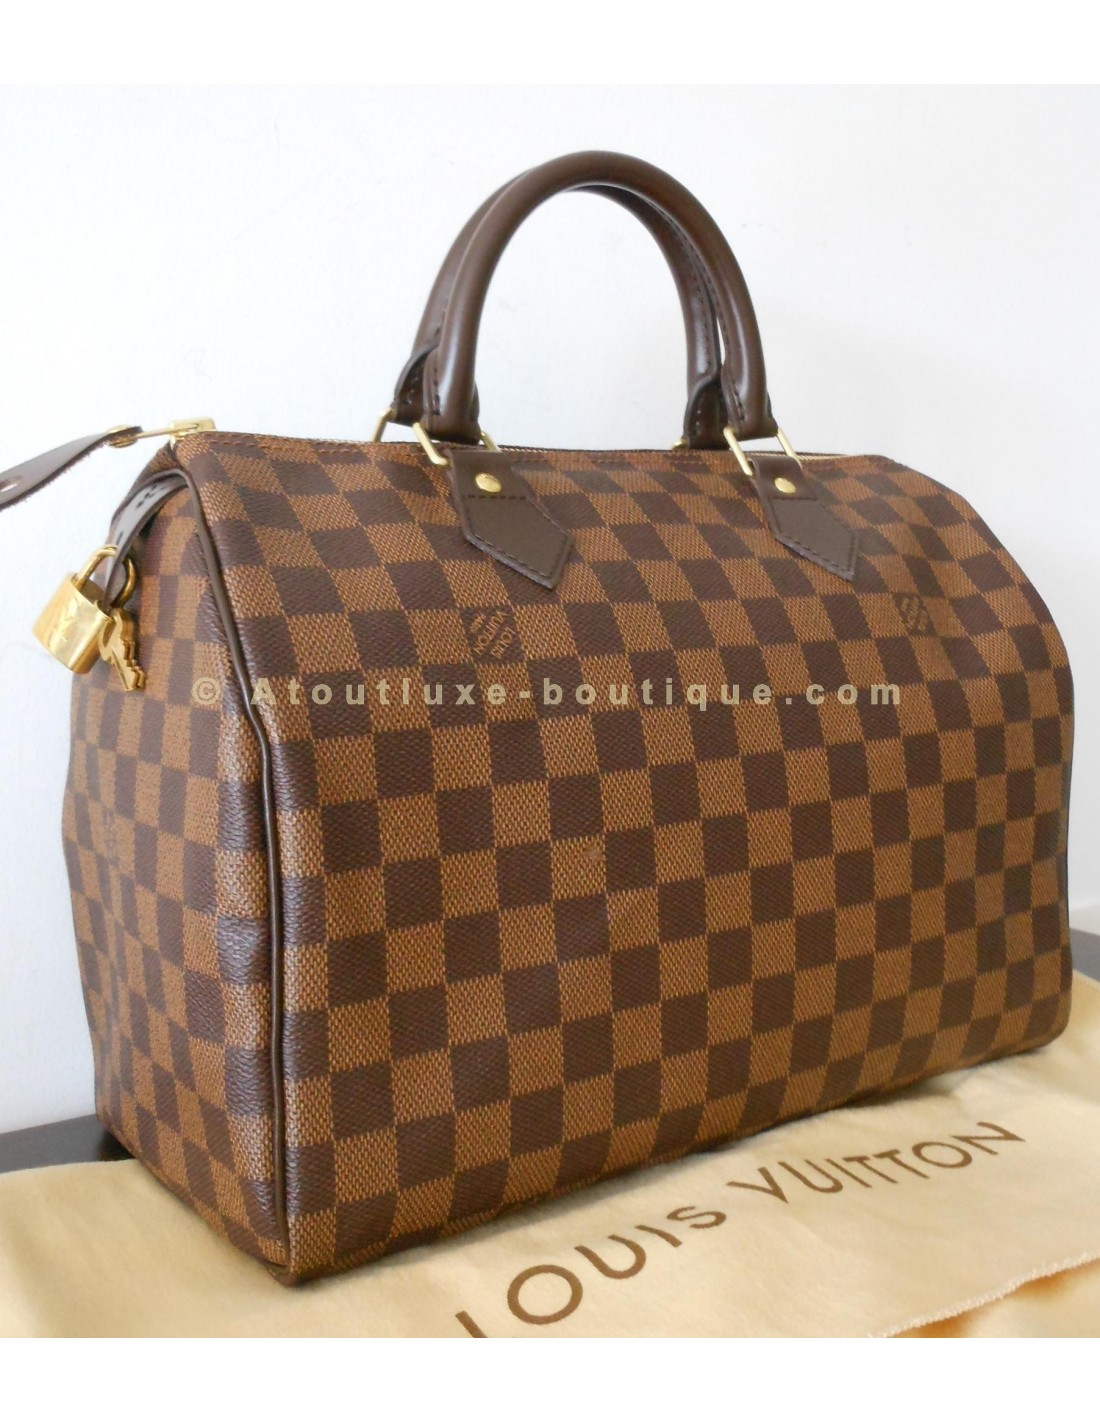 сумка Louis Vuitton Damier Ebene : Pin speedy damier ebene on